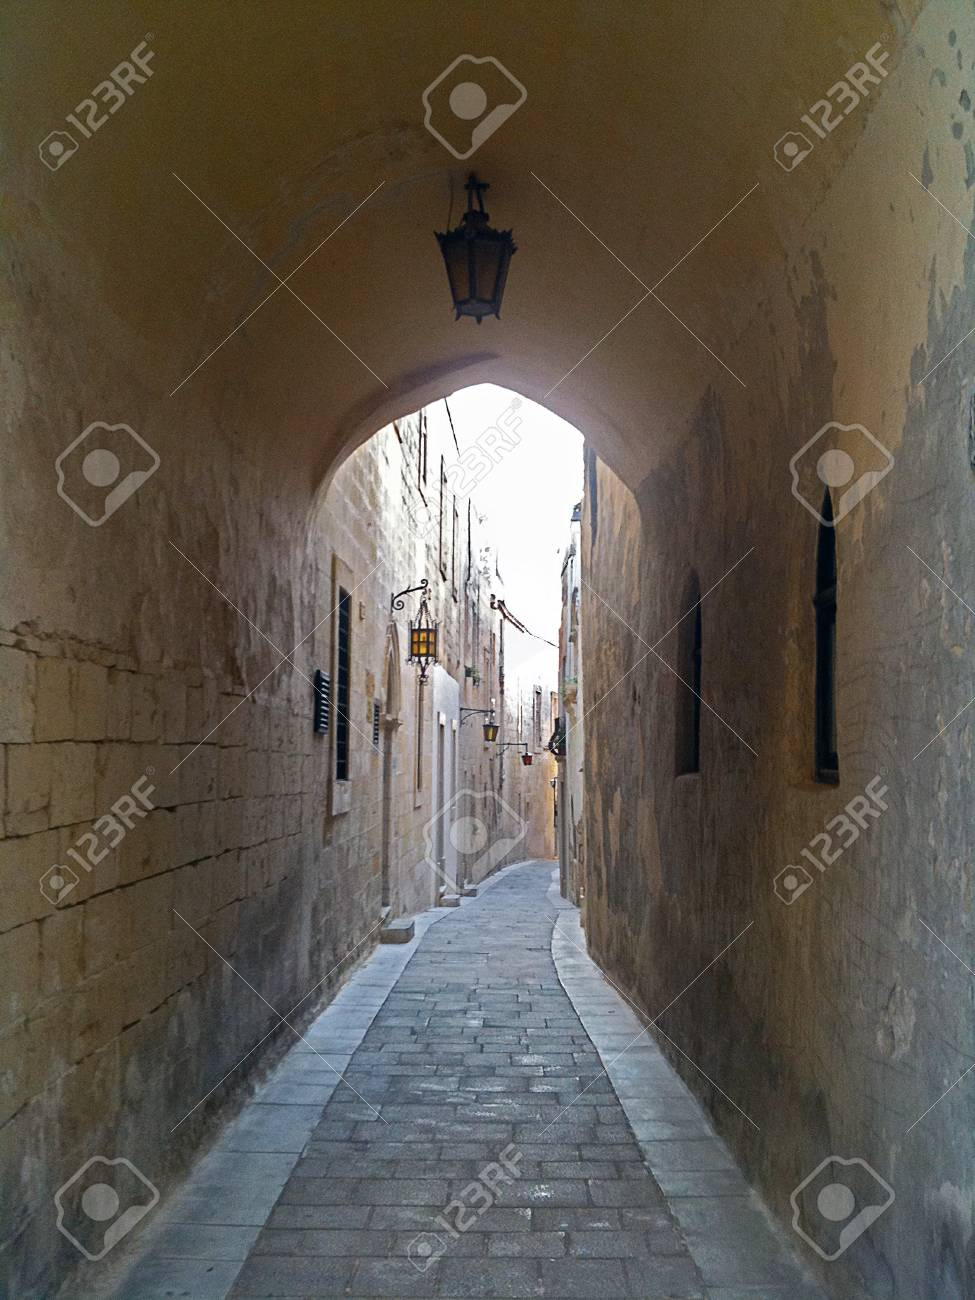 Mdina Street Tunnel - 34371407